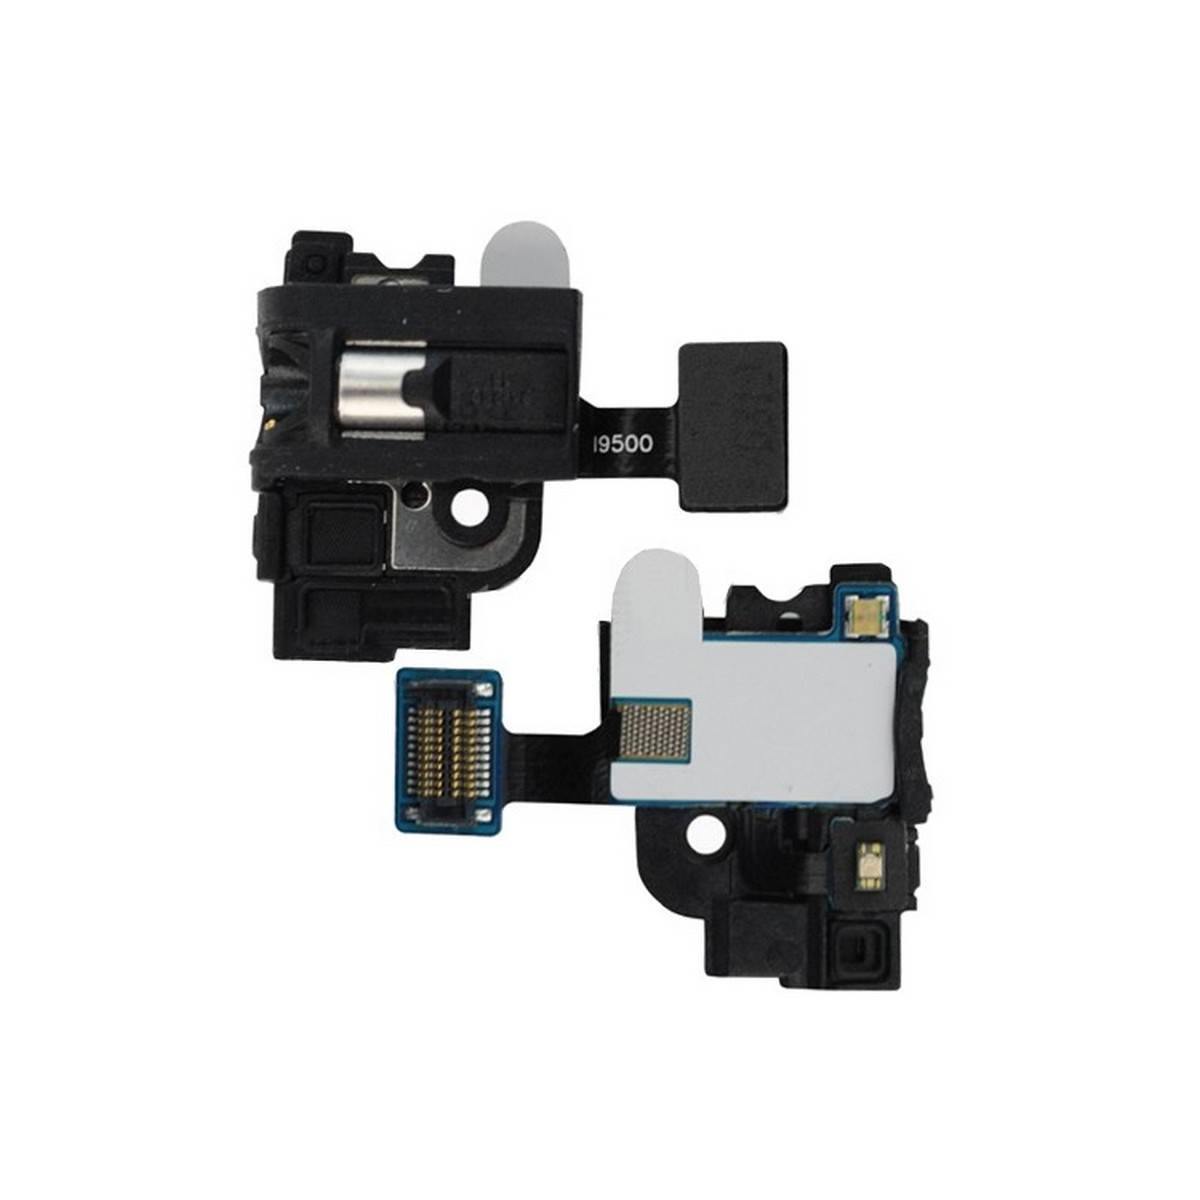 ALTAVOZ BUZZER SAMSUNG GALAXY S4, I9500